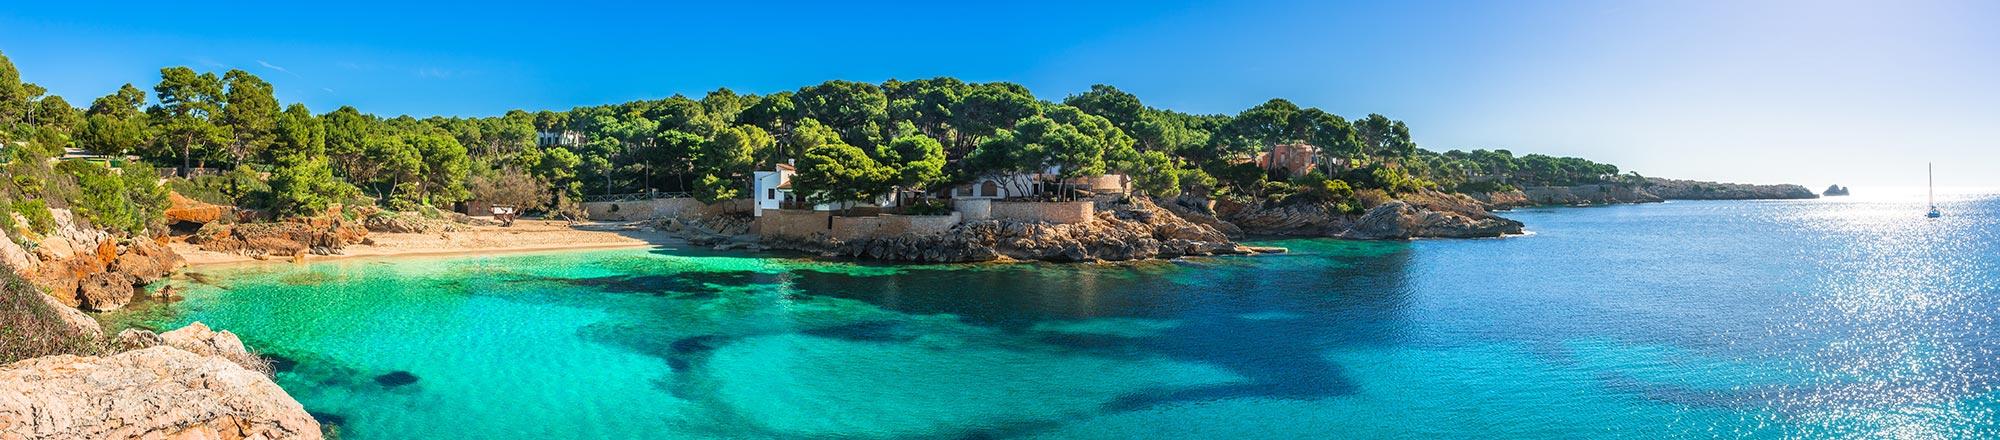 Provence-Alpes-Côtes d'Azur